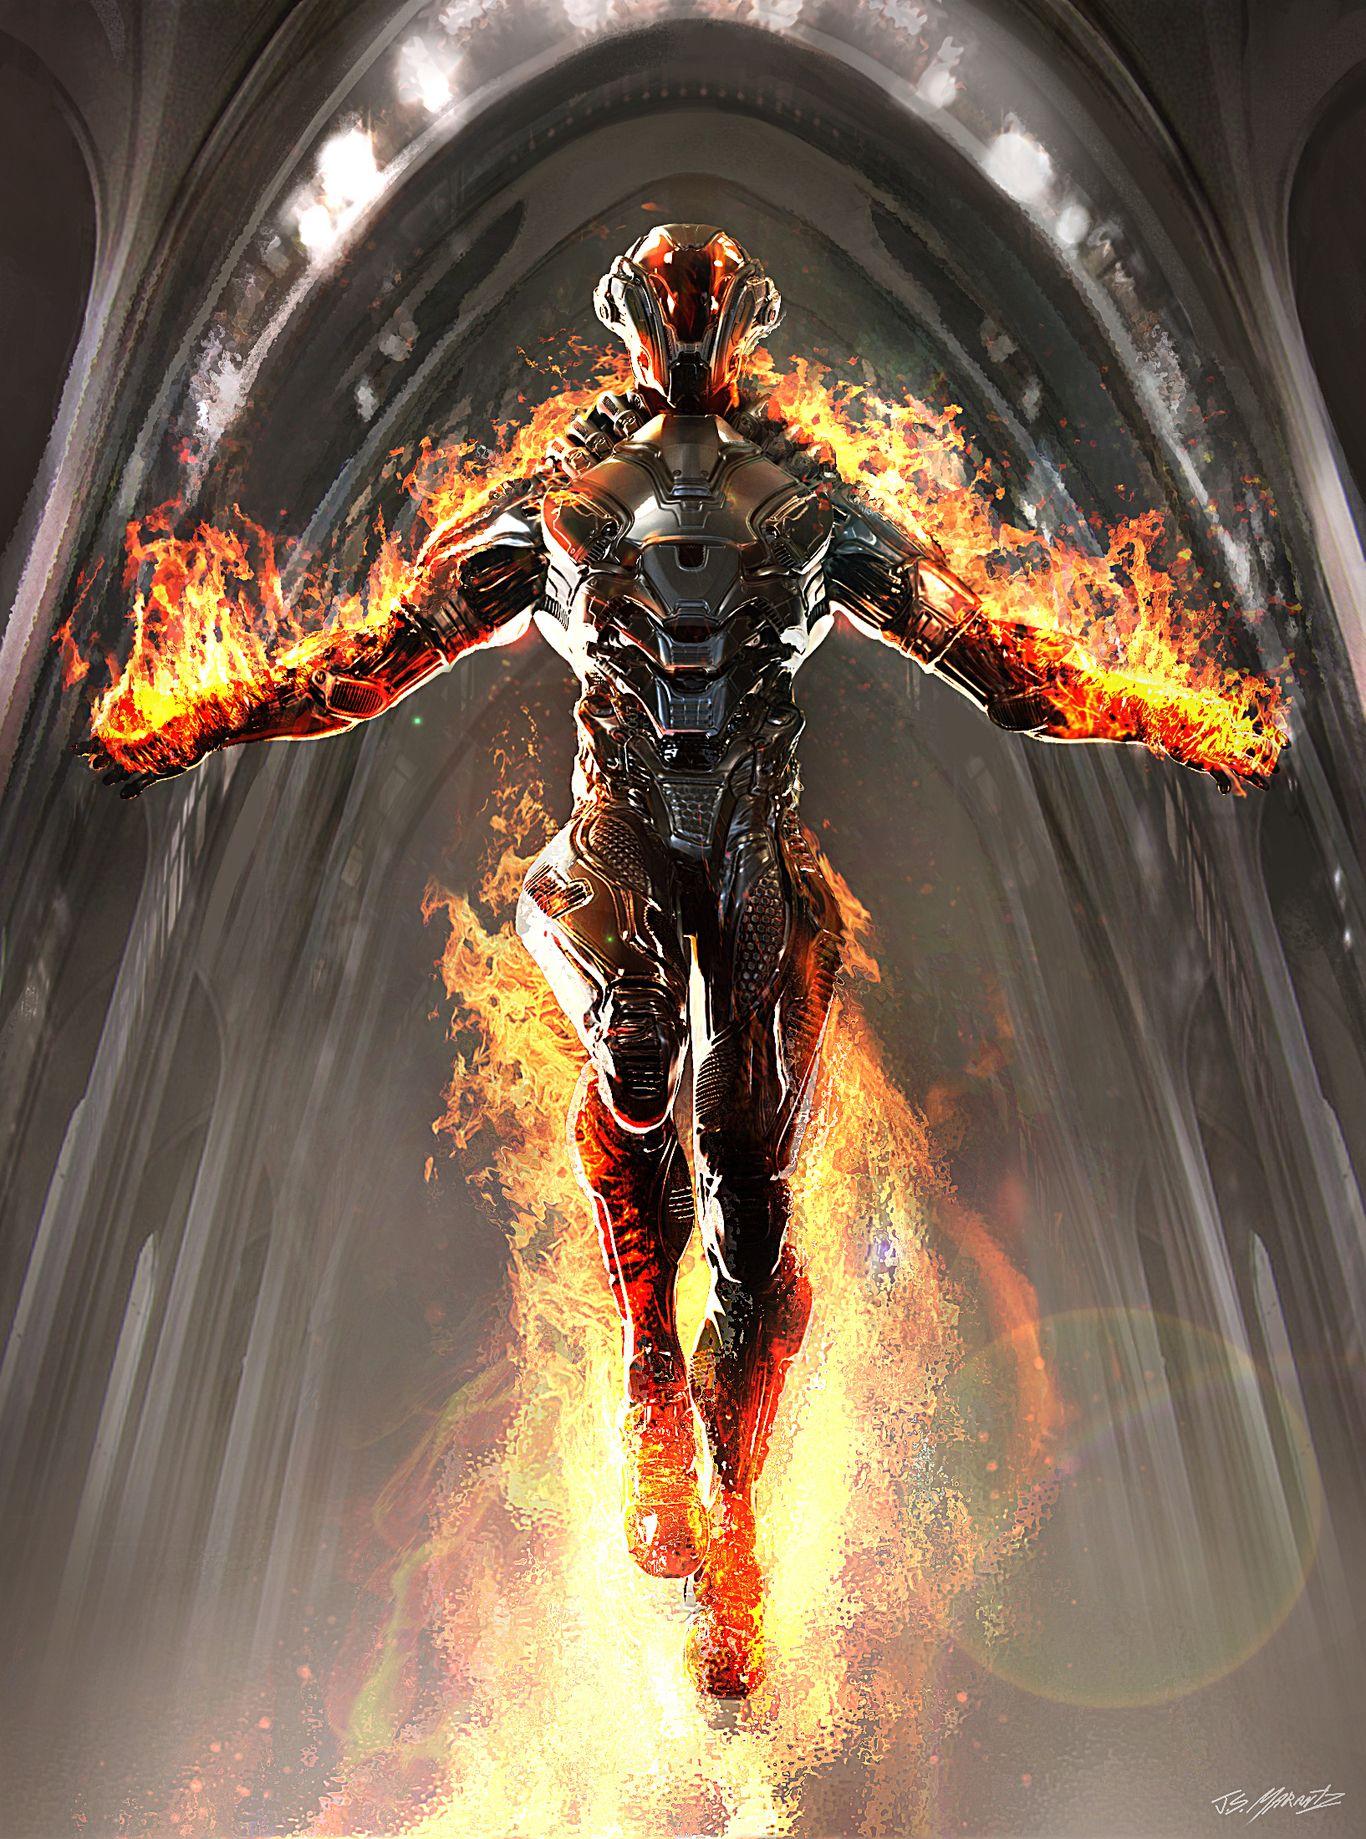 Ghost Rider Spirit Of Vengeance Concept By Jeradsmarantz Horror 2d Cgsociety Ghost Rider Wallpaper Pyro Chibi Marvel